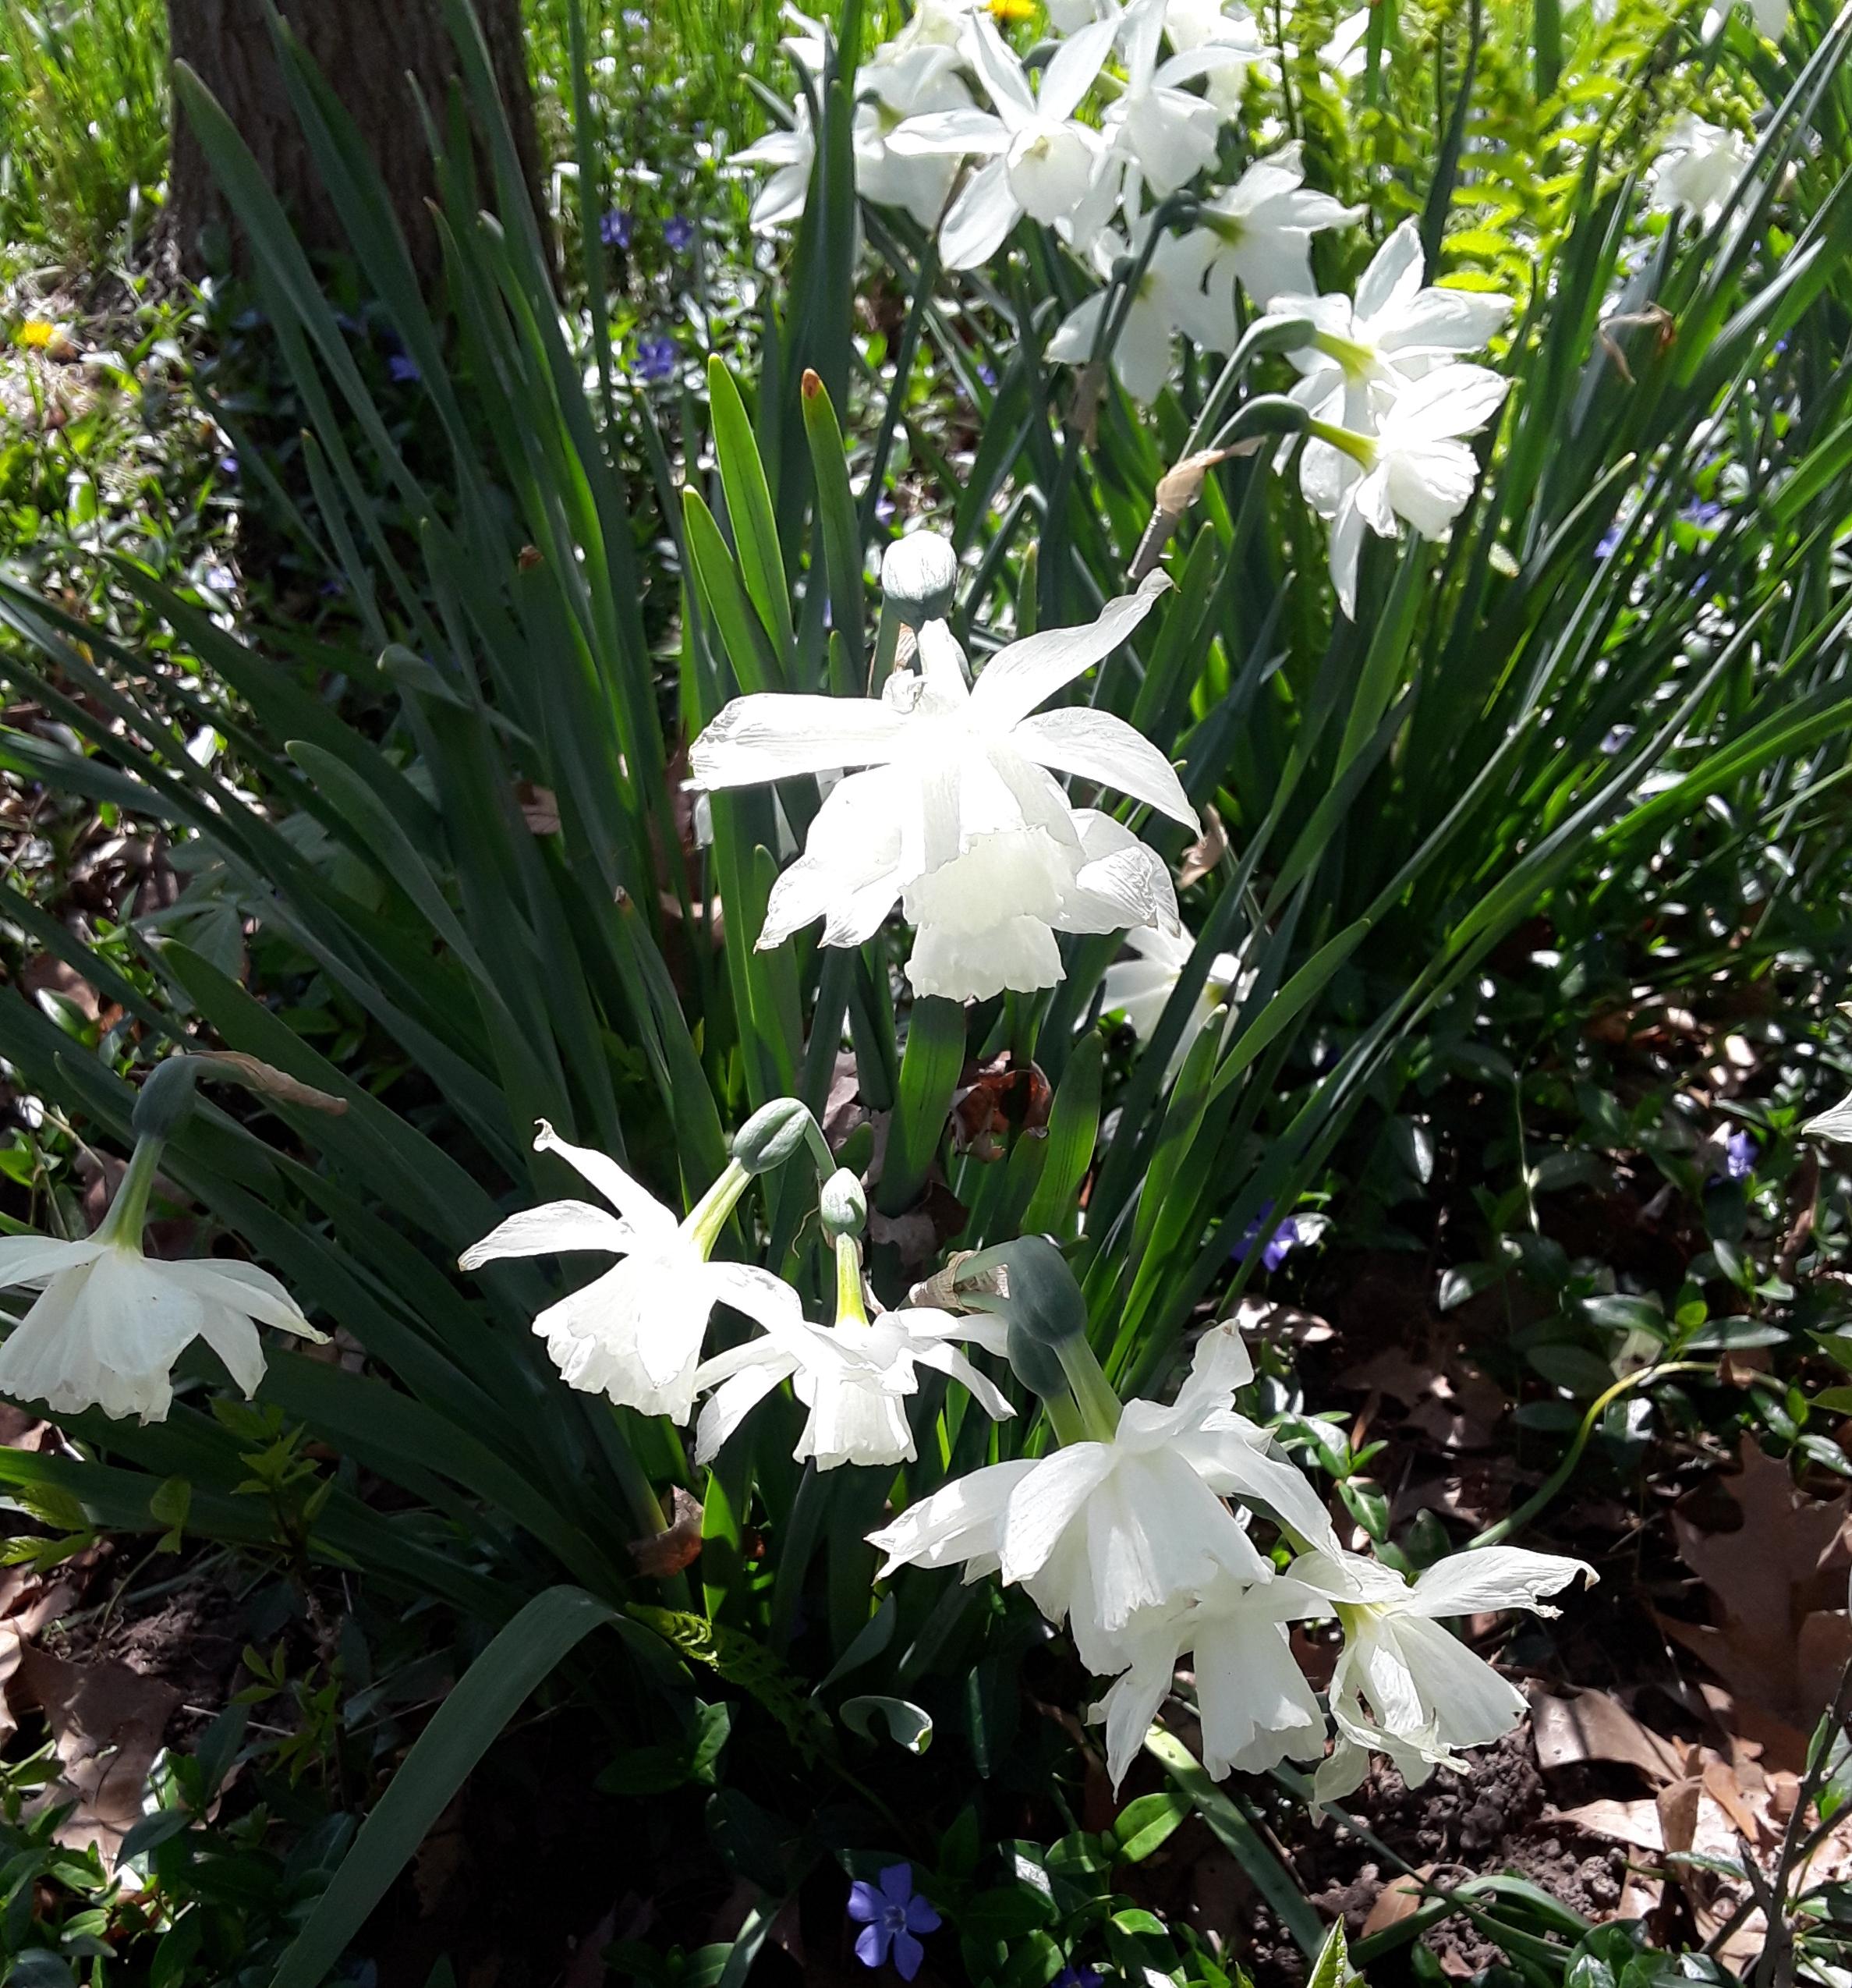 Thalia daffodils are pure white, cup and petals